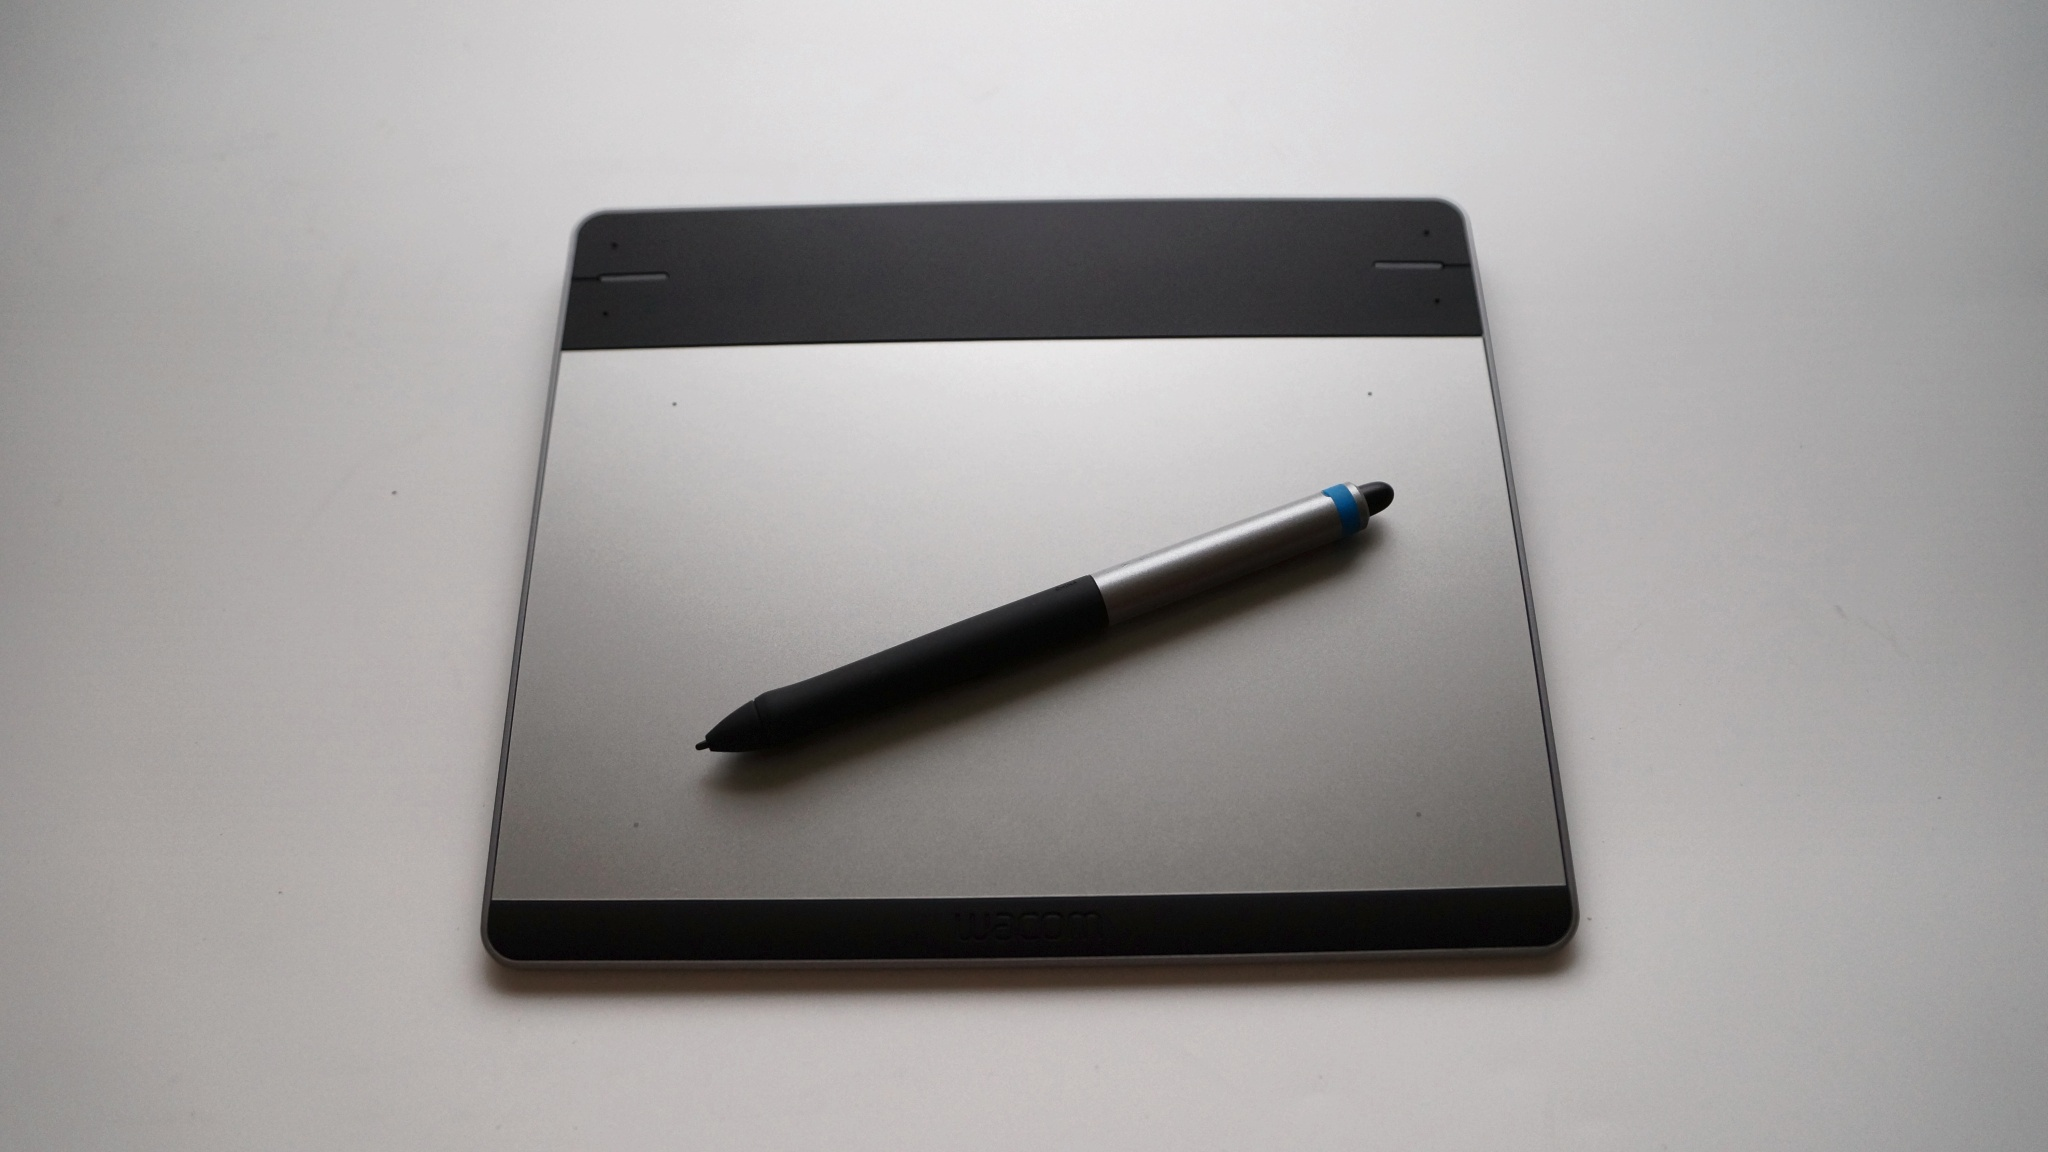 Обзор на Графический планшет WACOM Intuos Pen & Touch S (Small) w/SW